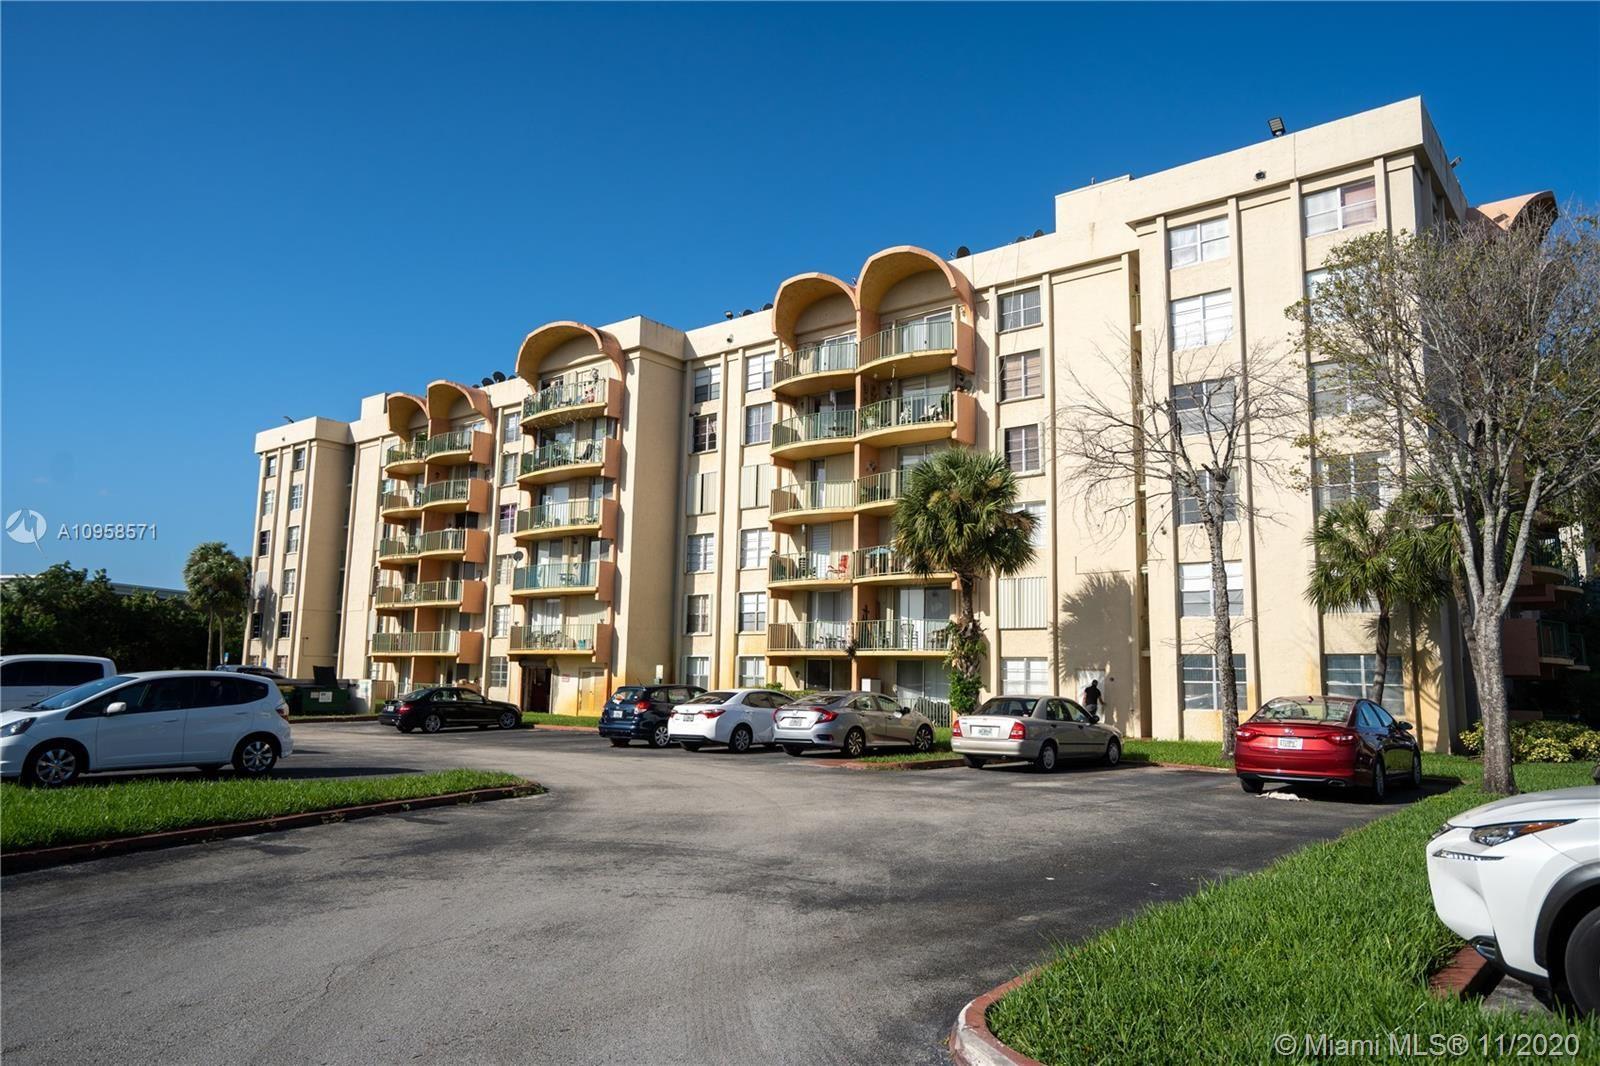 9310 Fontainebleau Blvd #302, Miami, FL 33172 - #: A10958571